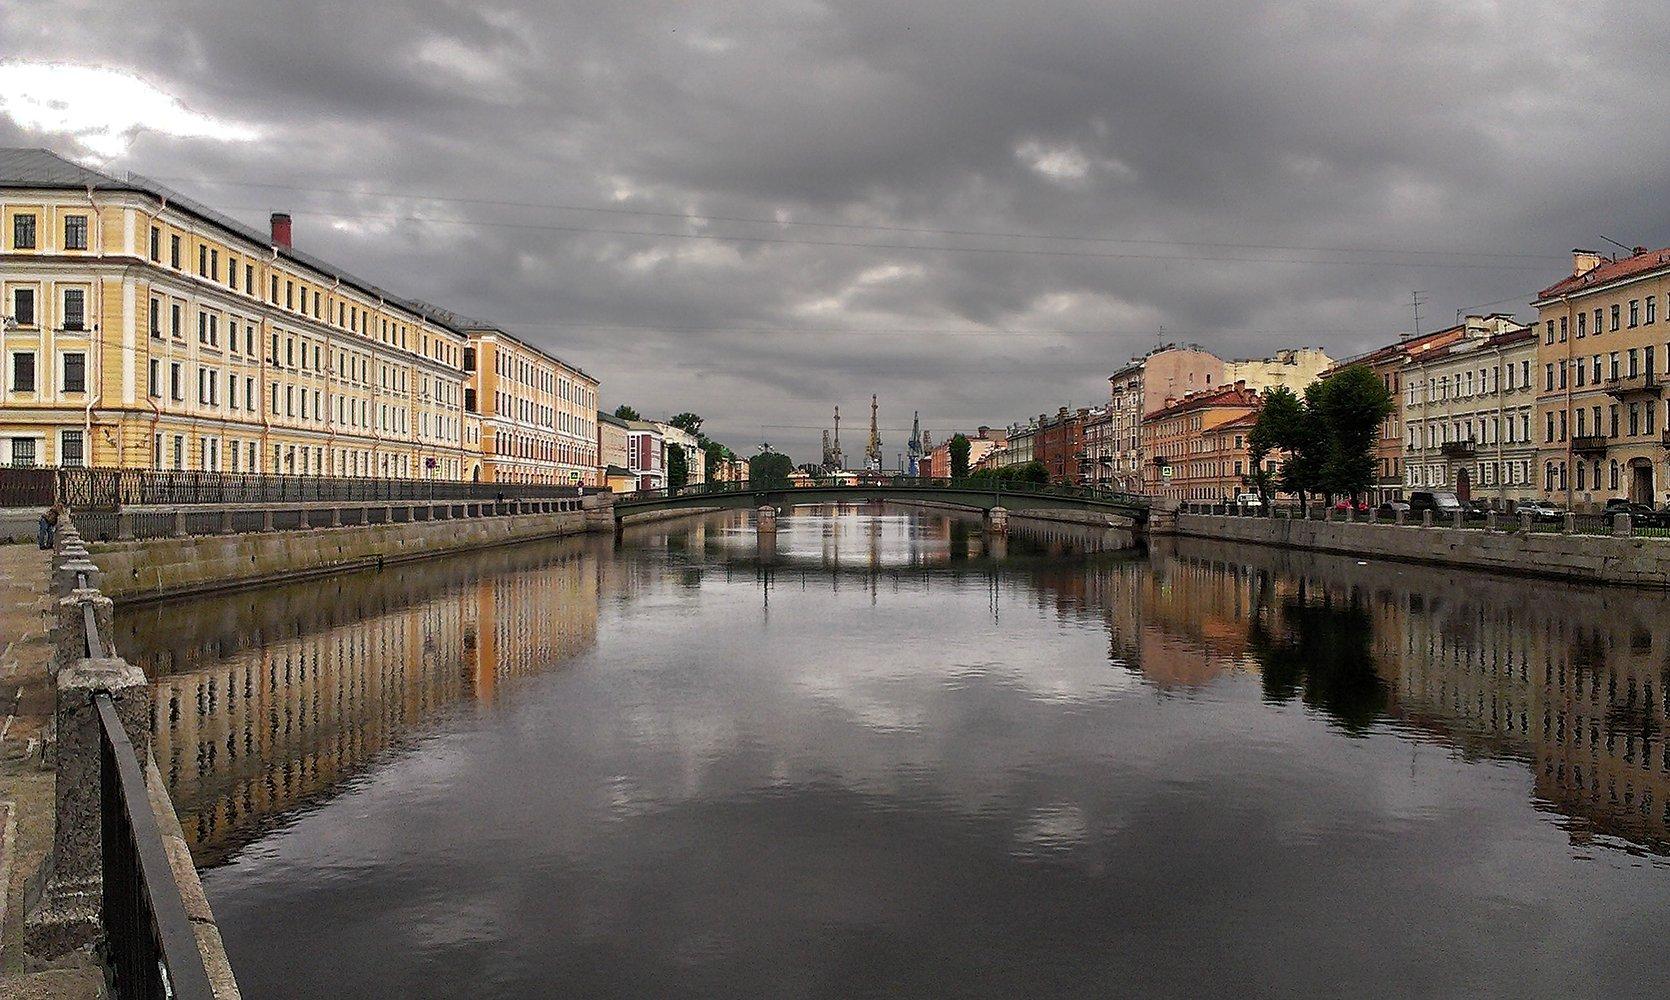 #deep.spb, #deepspb, #санктпетербург, #петербург, #спб, #питер, #saintpetersburg, #petersburg, #spb, #piter, #город, #city, #street, #streetphoto, #streetphotography, #cityscape, #urbex, #urbexphoto, #urbanexploration, #streetphotography, #architecture, #, deep.spb